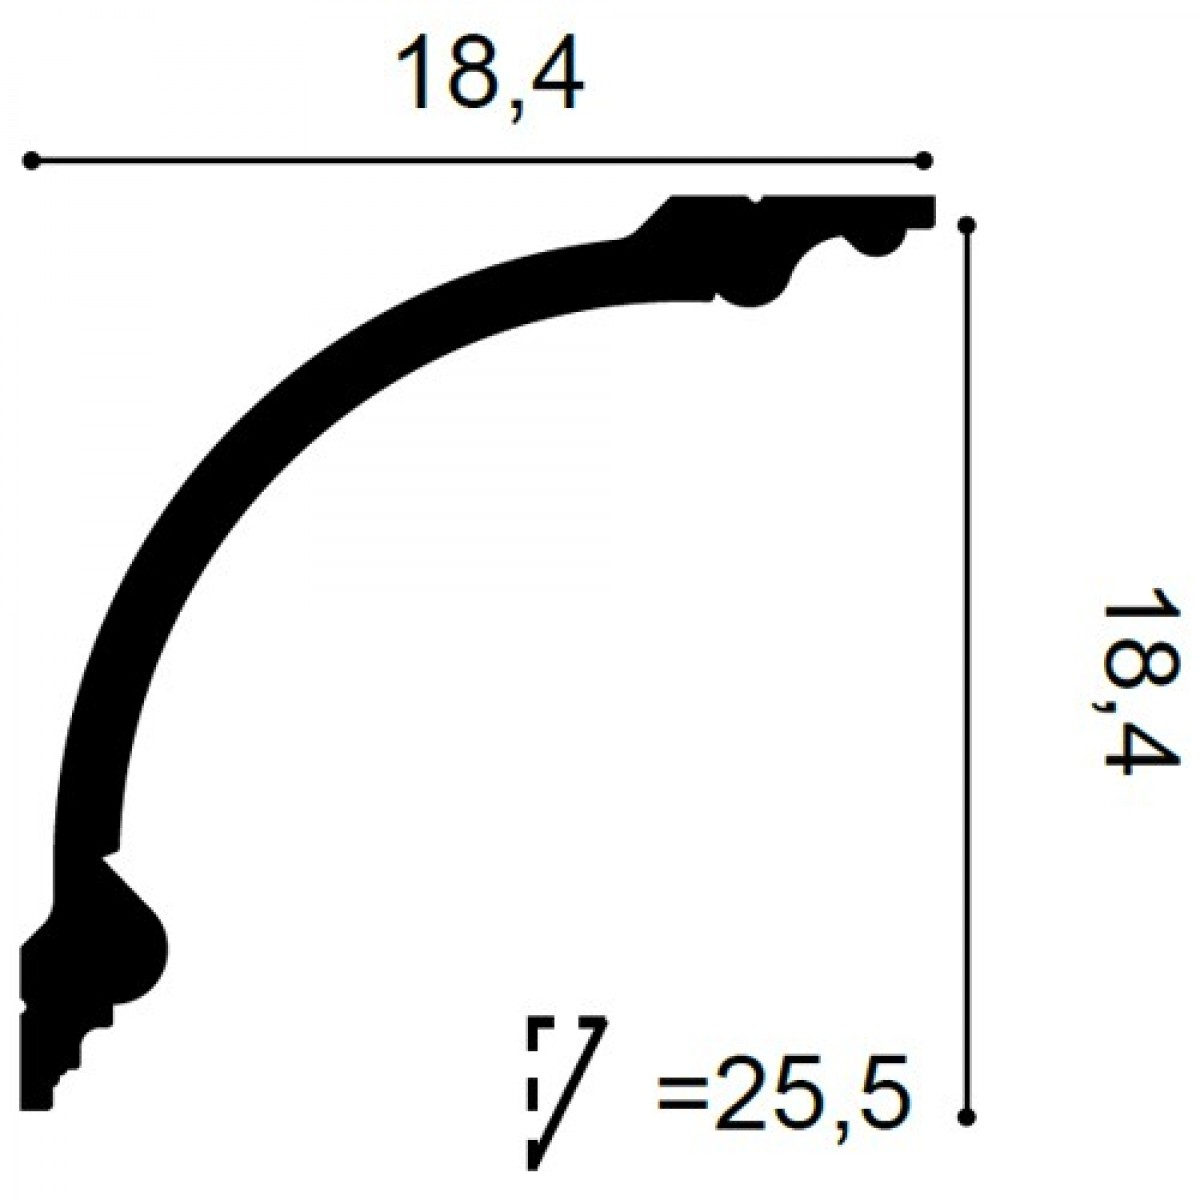 Cornisa Luxxus C338A, Dimensiuni: 200 X 18.4 X 18.4 cm, Orac Decor